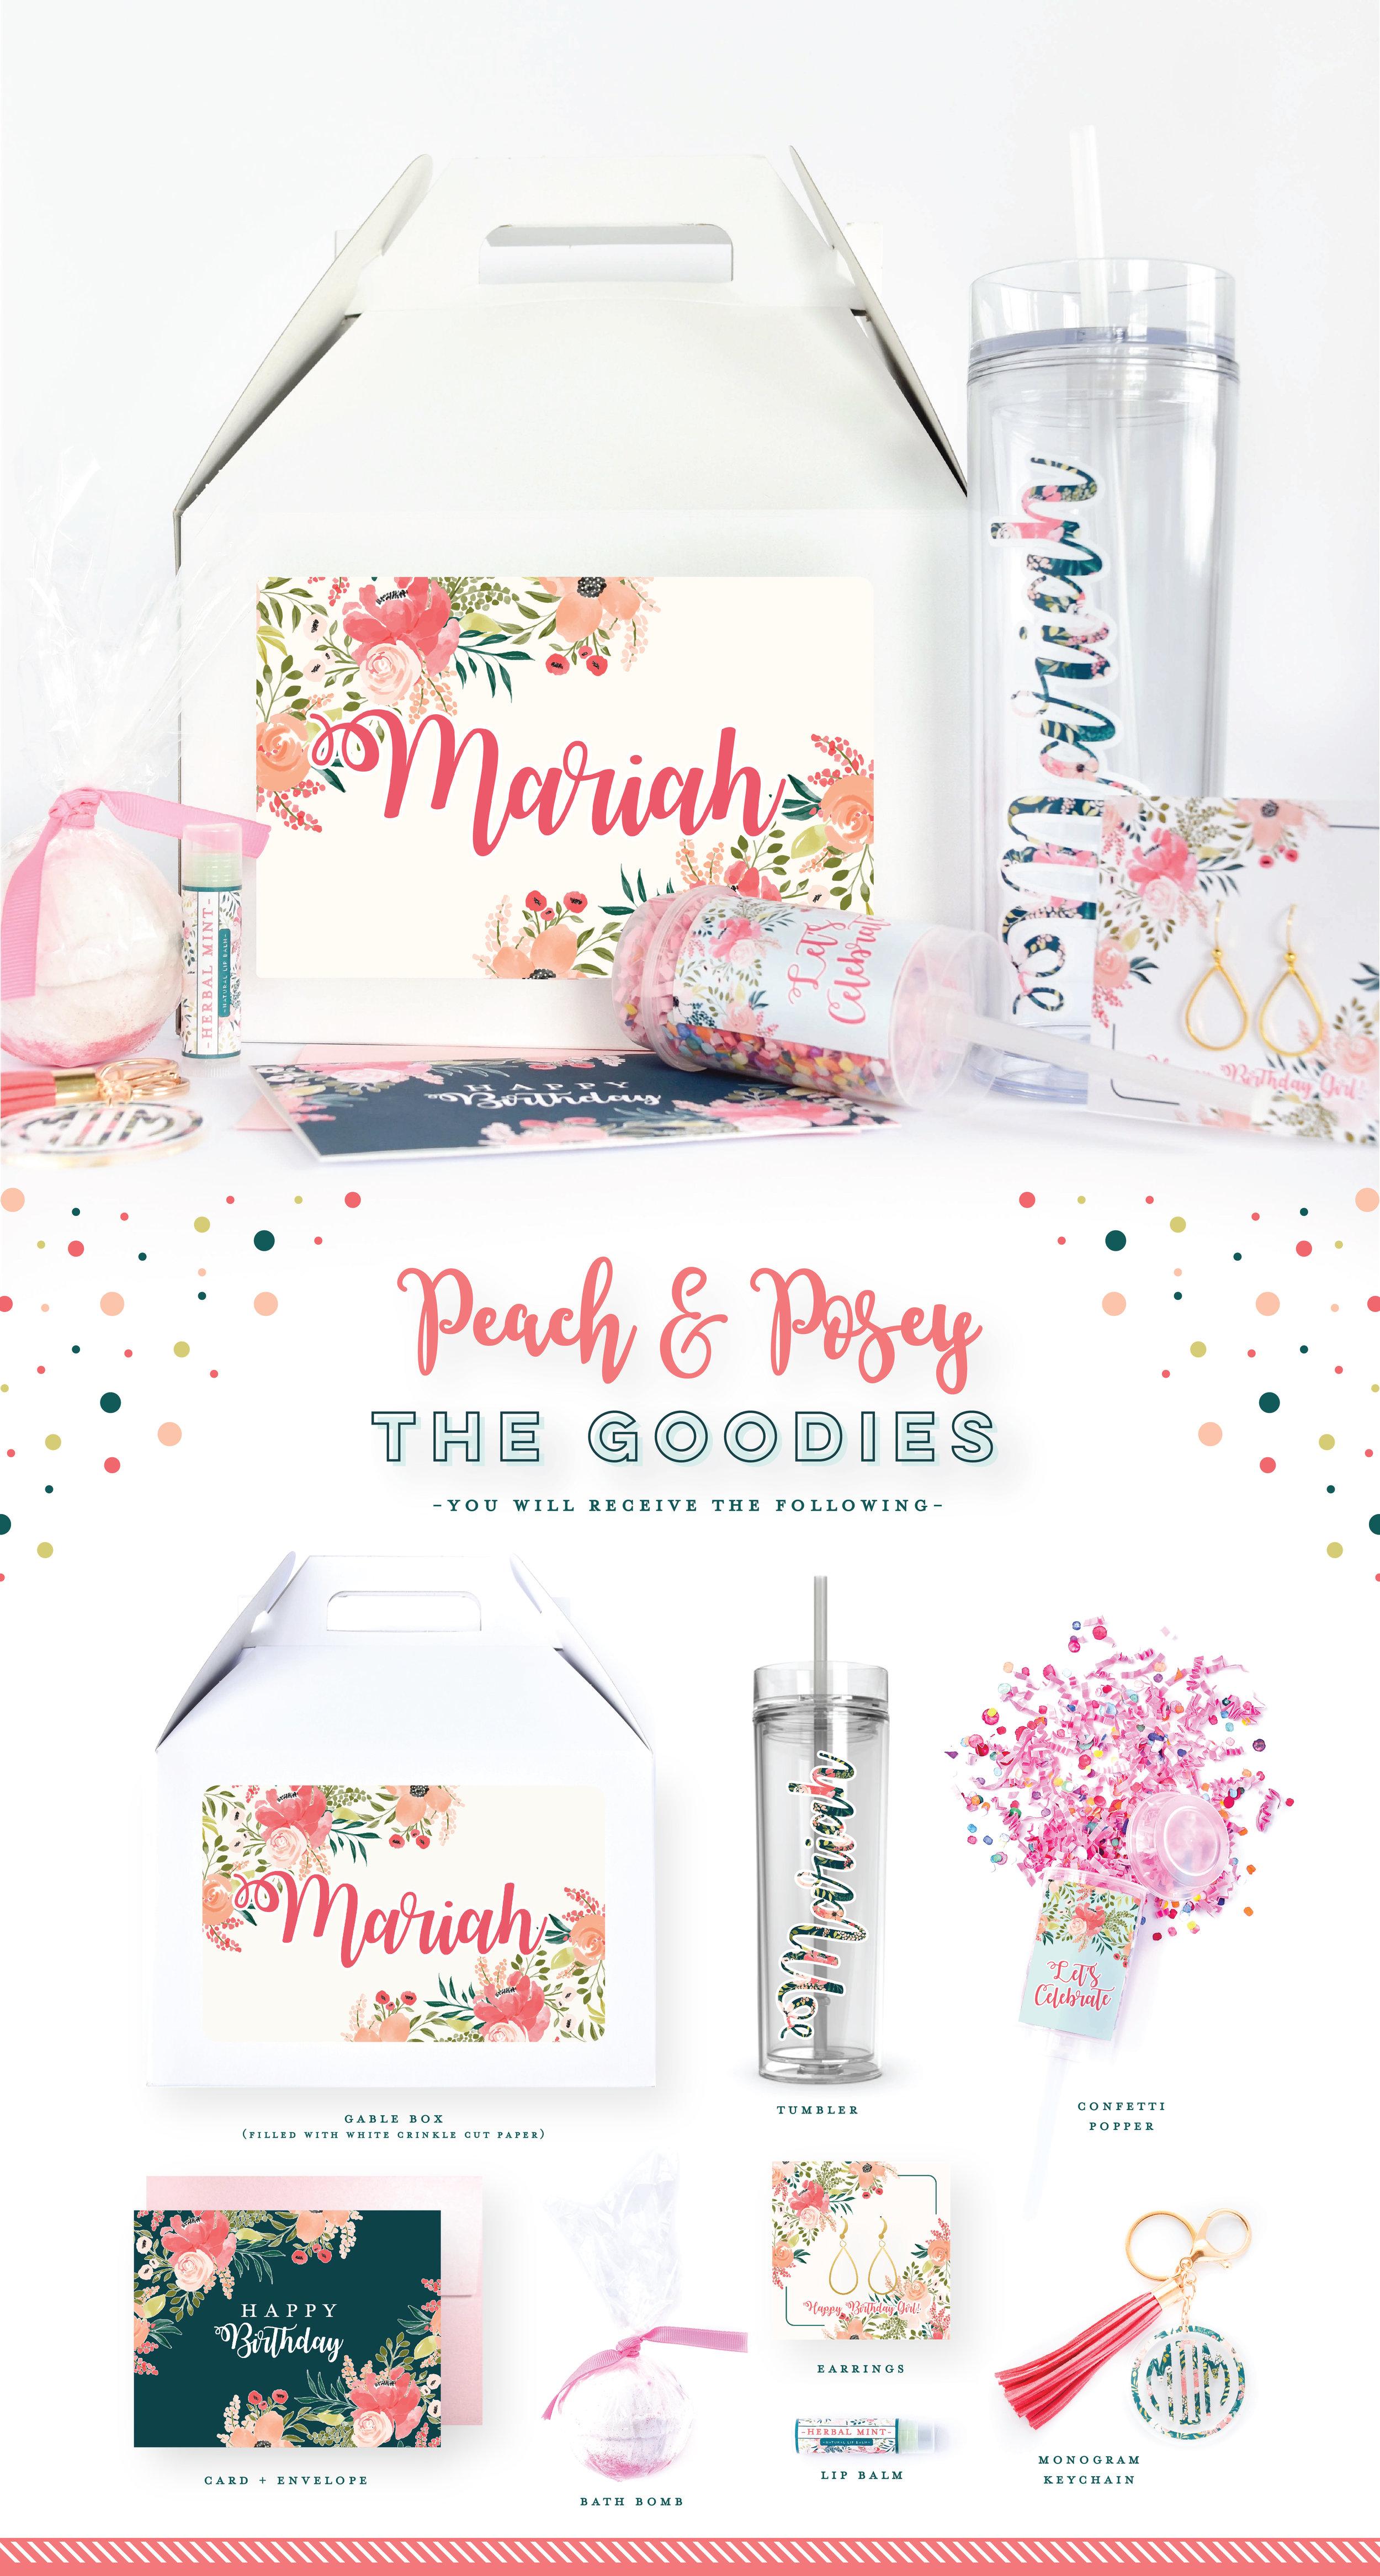 Peach & Posey-01-01.jpg